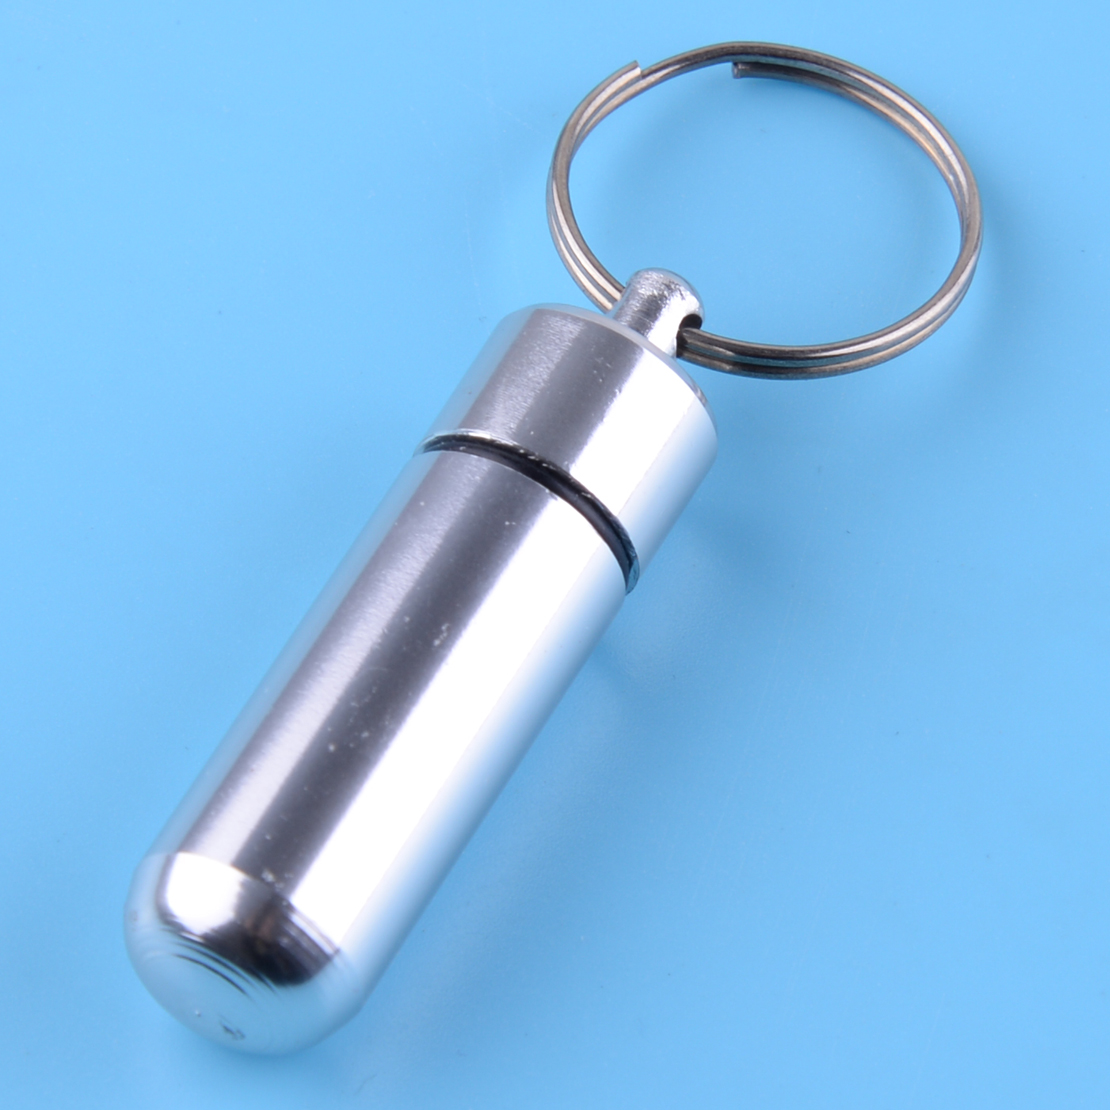 Wasserdicht Tablettendose Mini EDC Pillendose Schlüsselanhänger Medikamenten